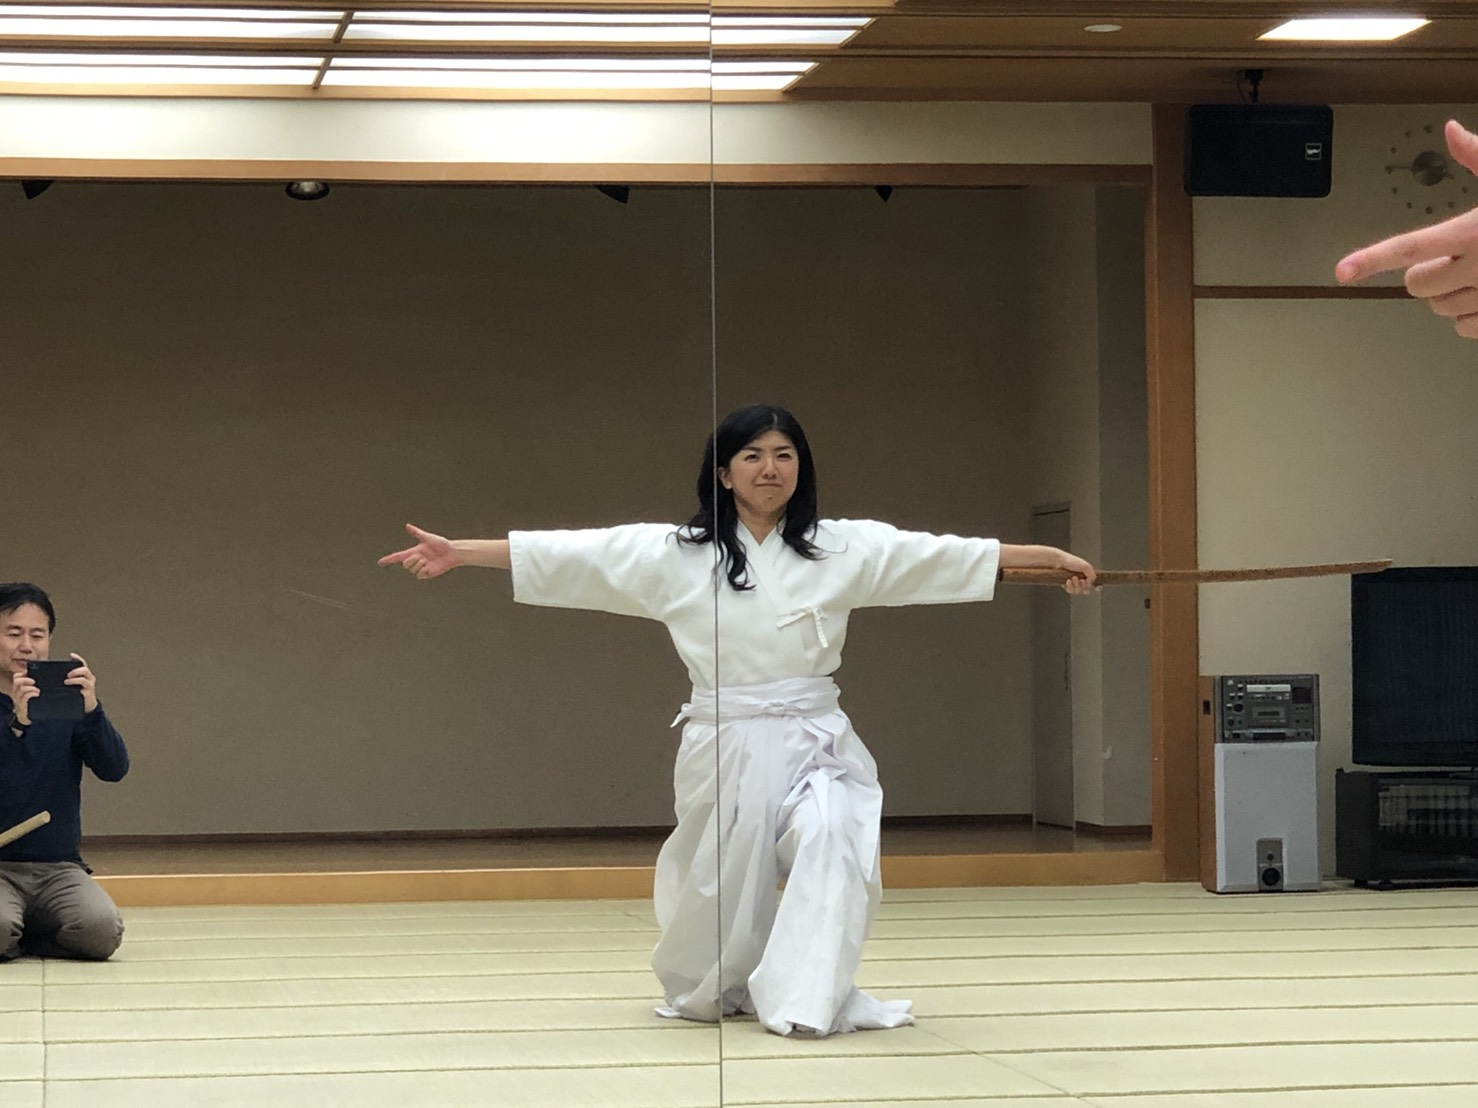 S  85254212 - 釈正輪老師、武道礼法&呼吸法開催